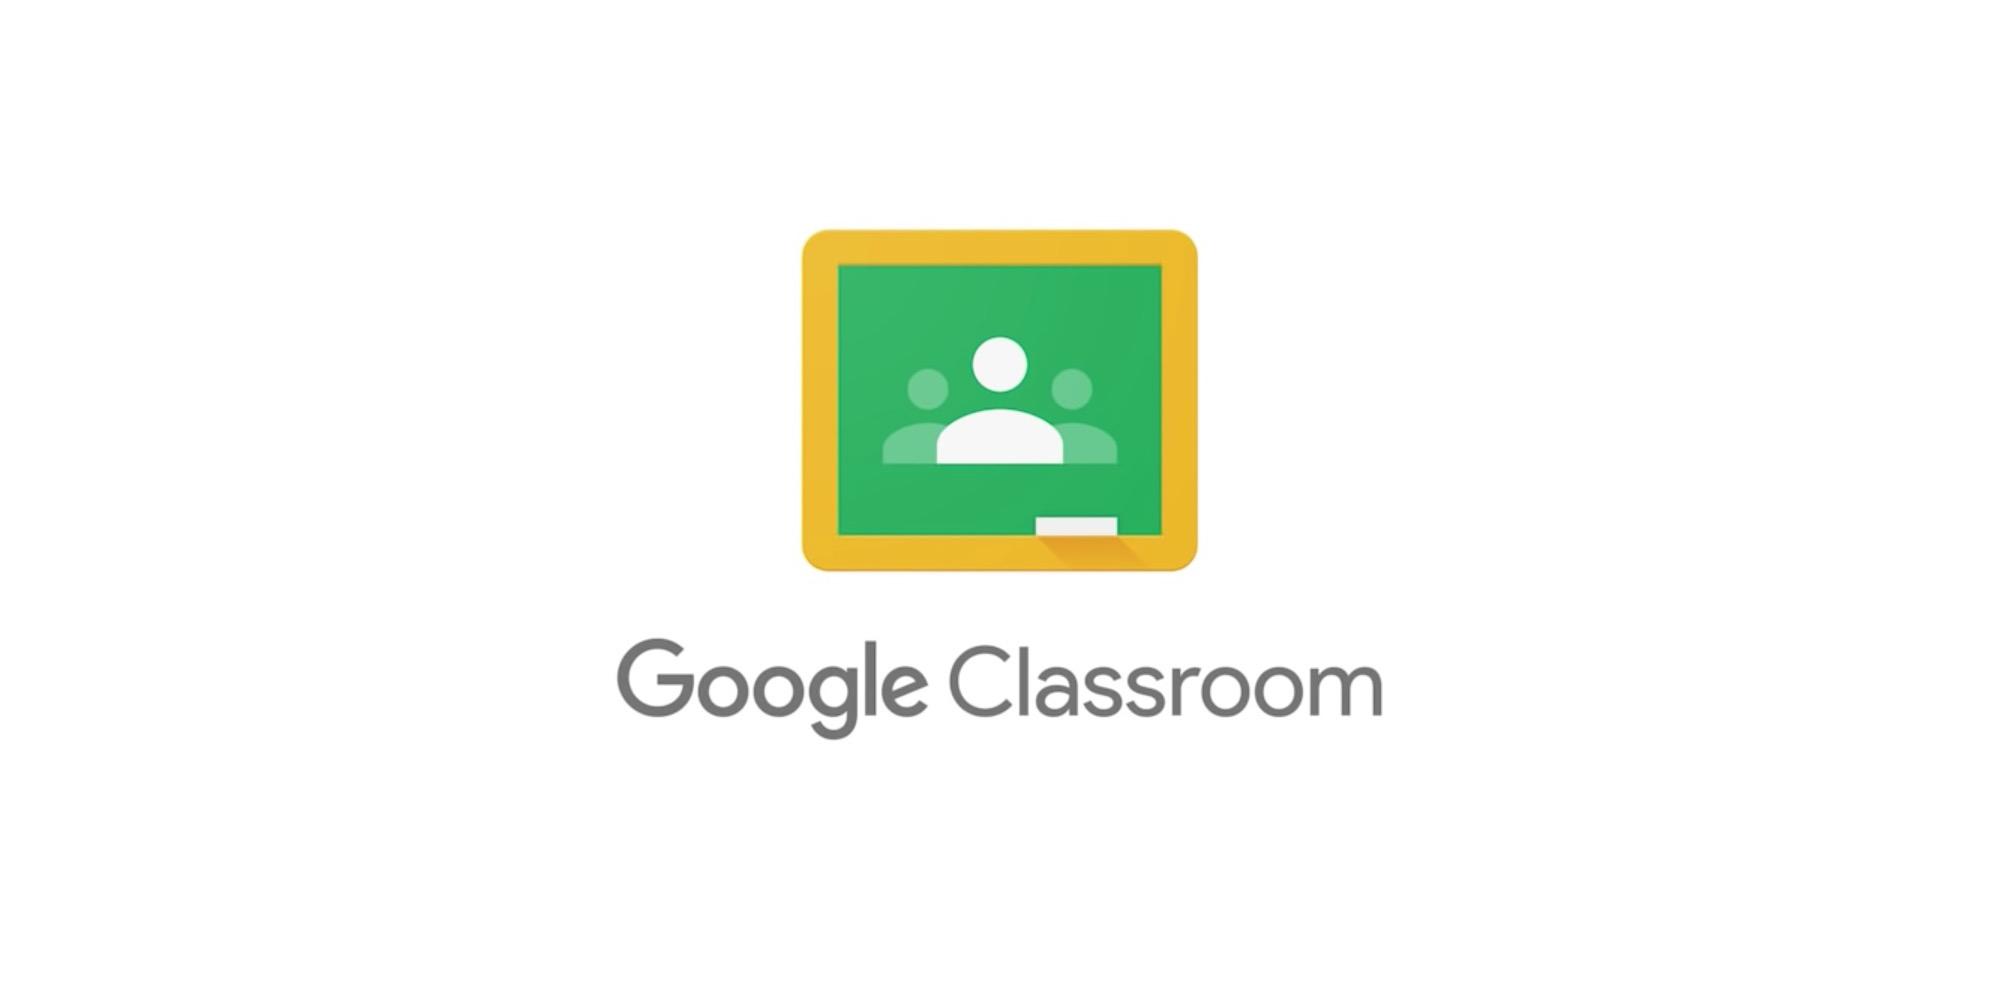 Google Classroom is the most popular education app on Android and iOS amid coronavirus